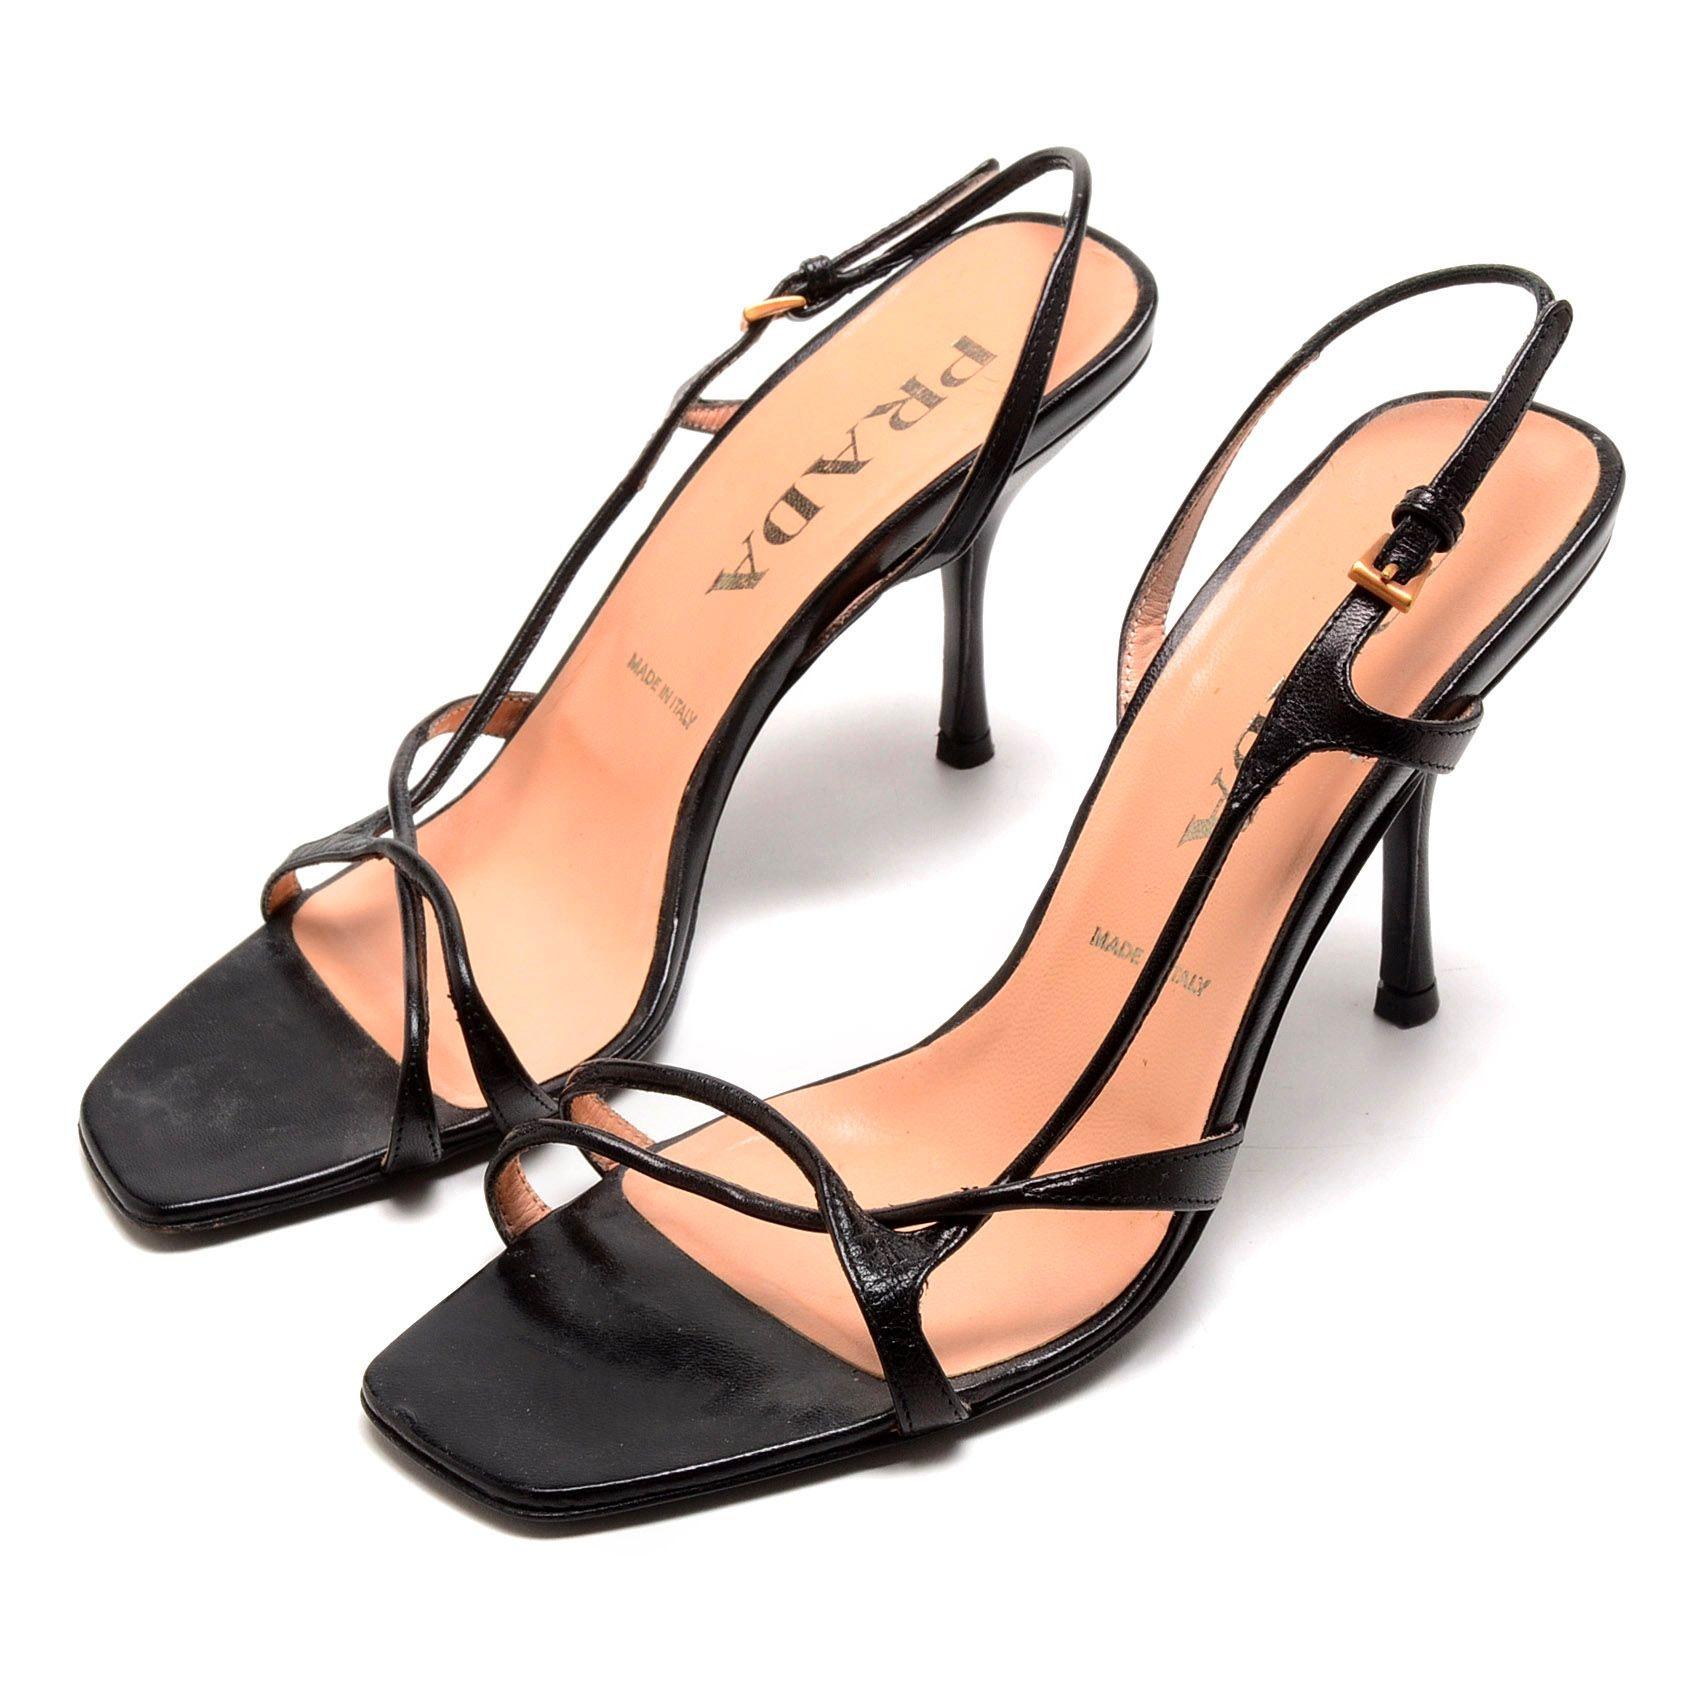 Prada Black Leather Strappy Slingback Dress Sandals